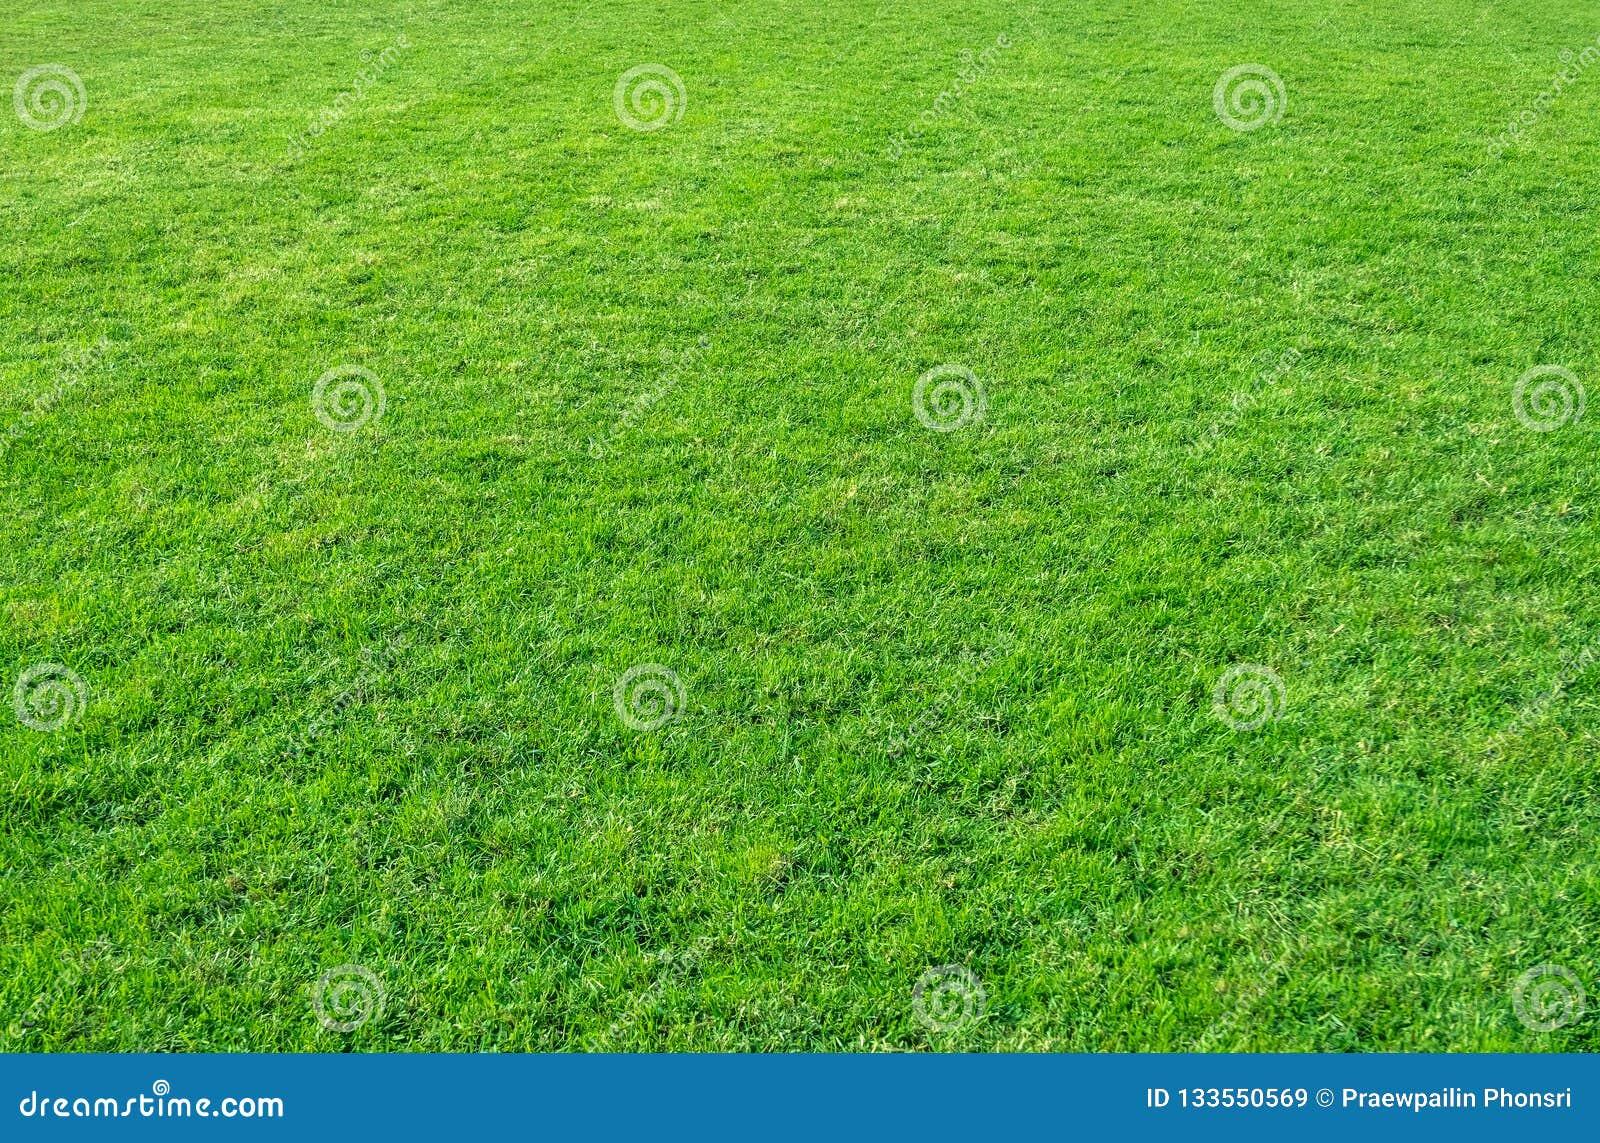 Background of green grass field. Green grass pattern and texture